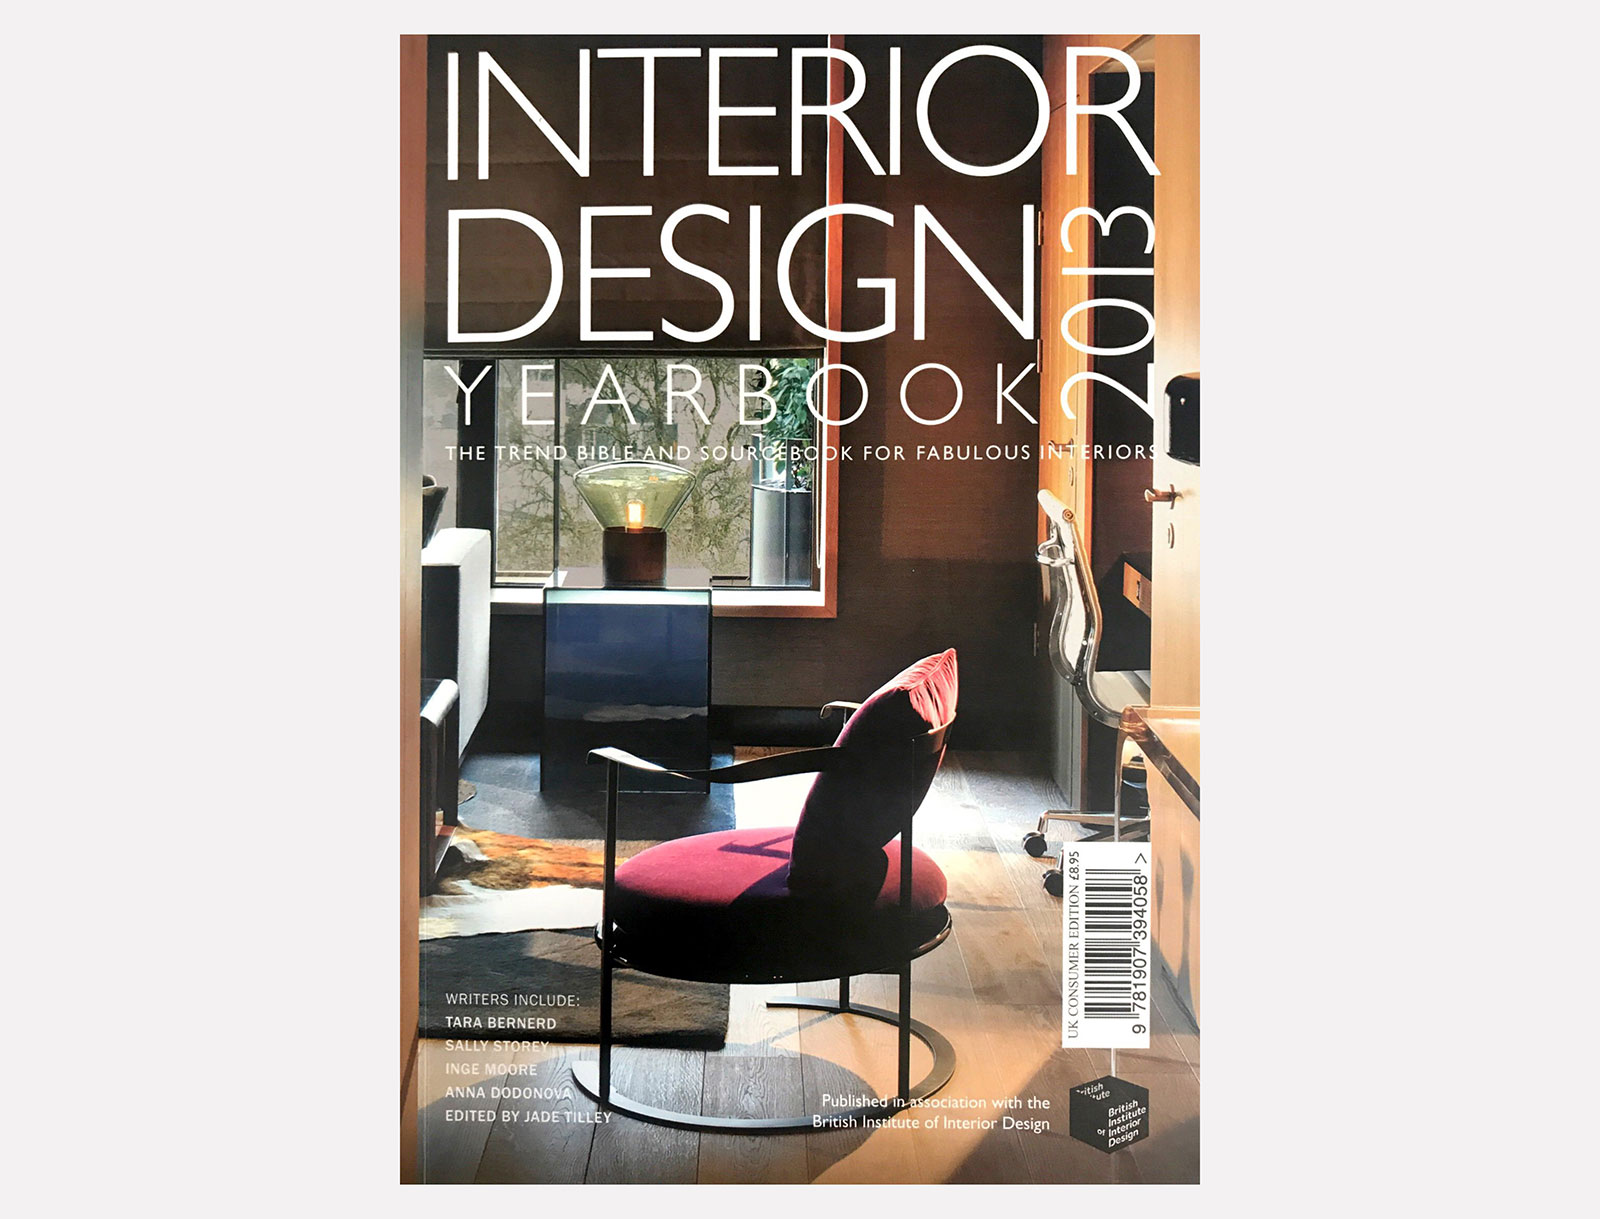 INTERIOR DESIGN YEARBOOK - 2013 1